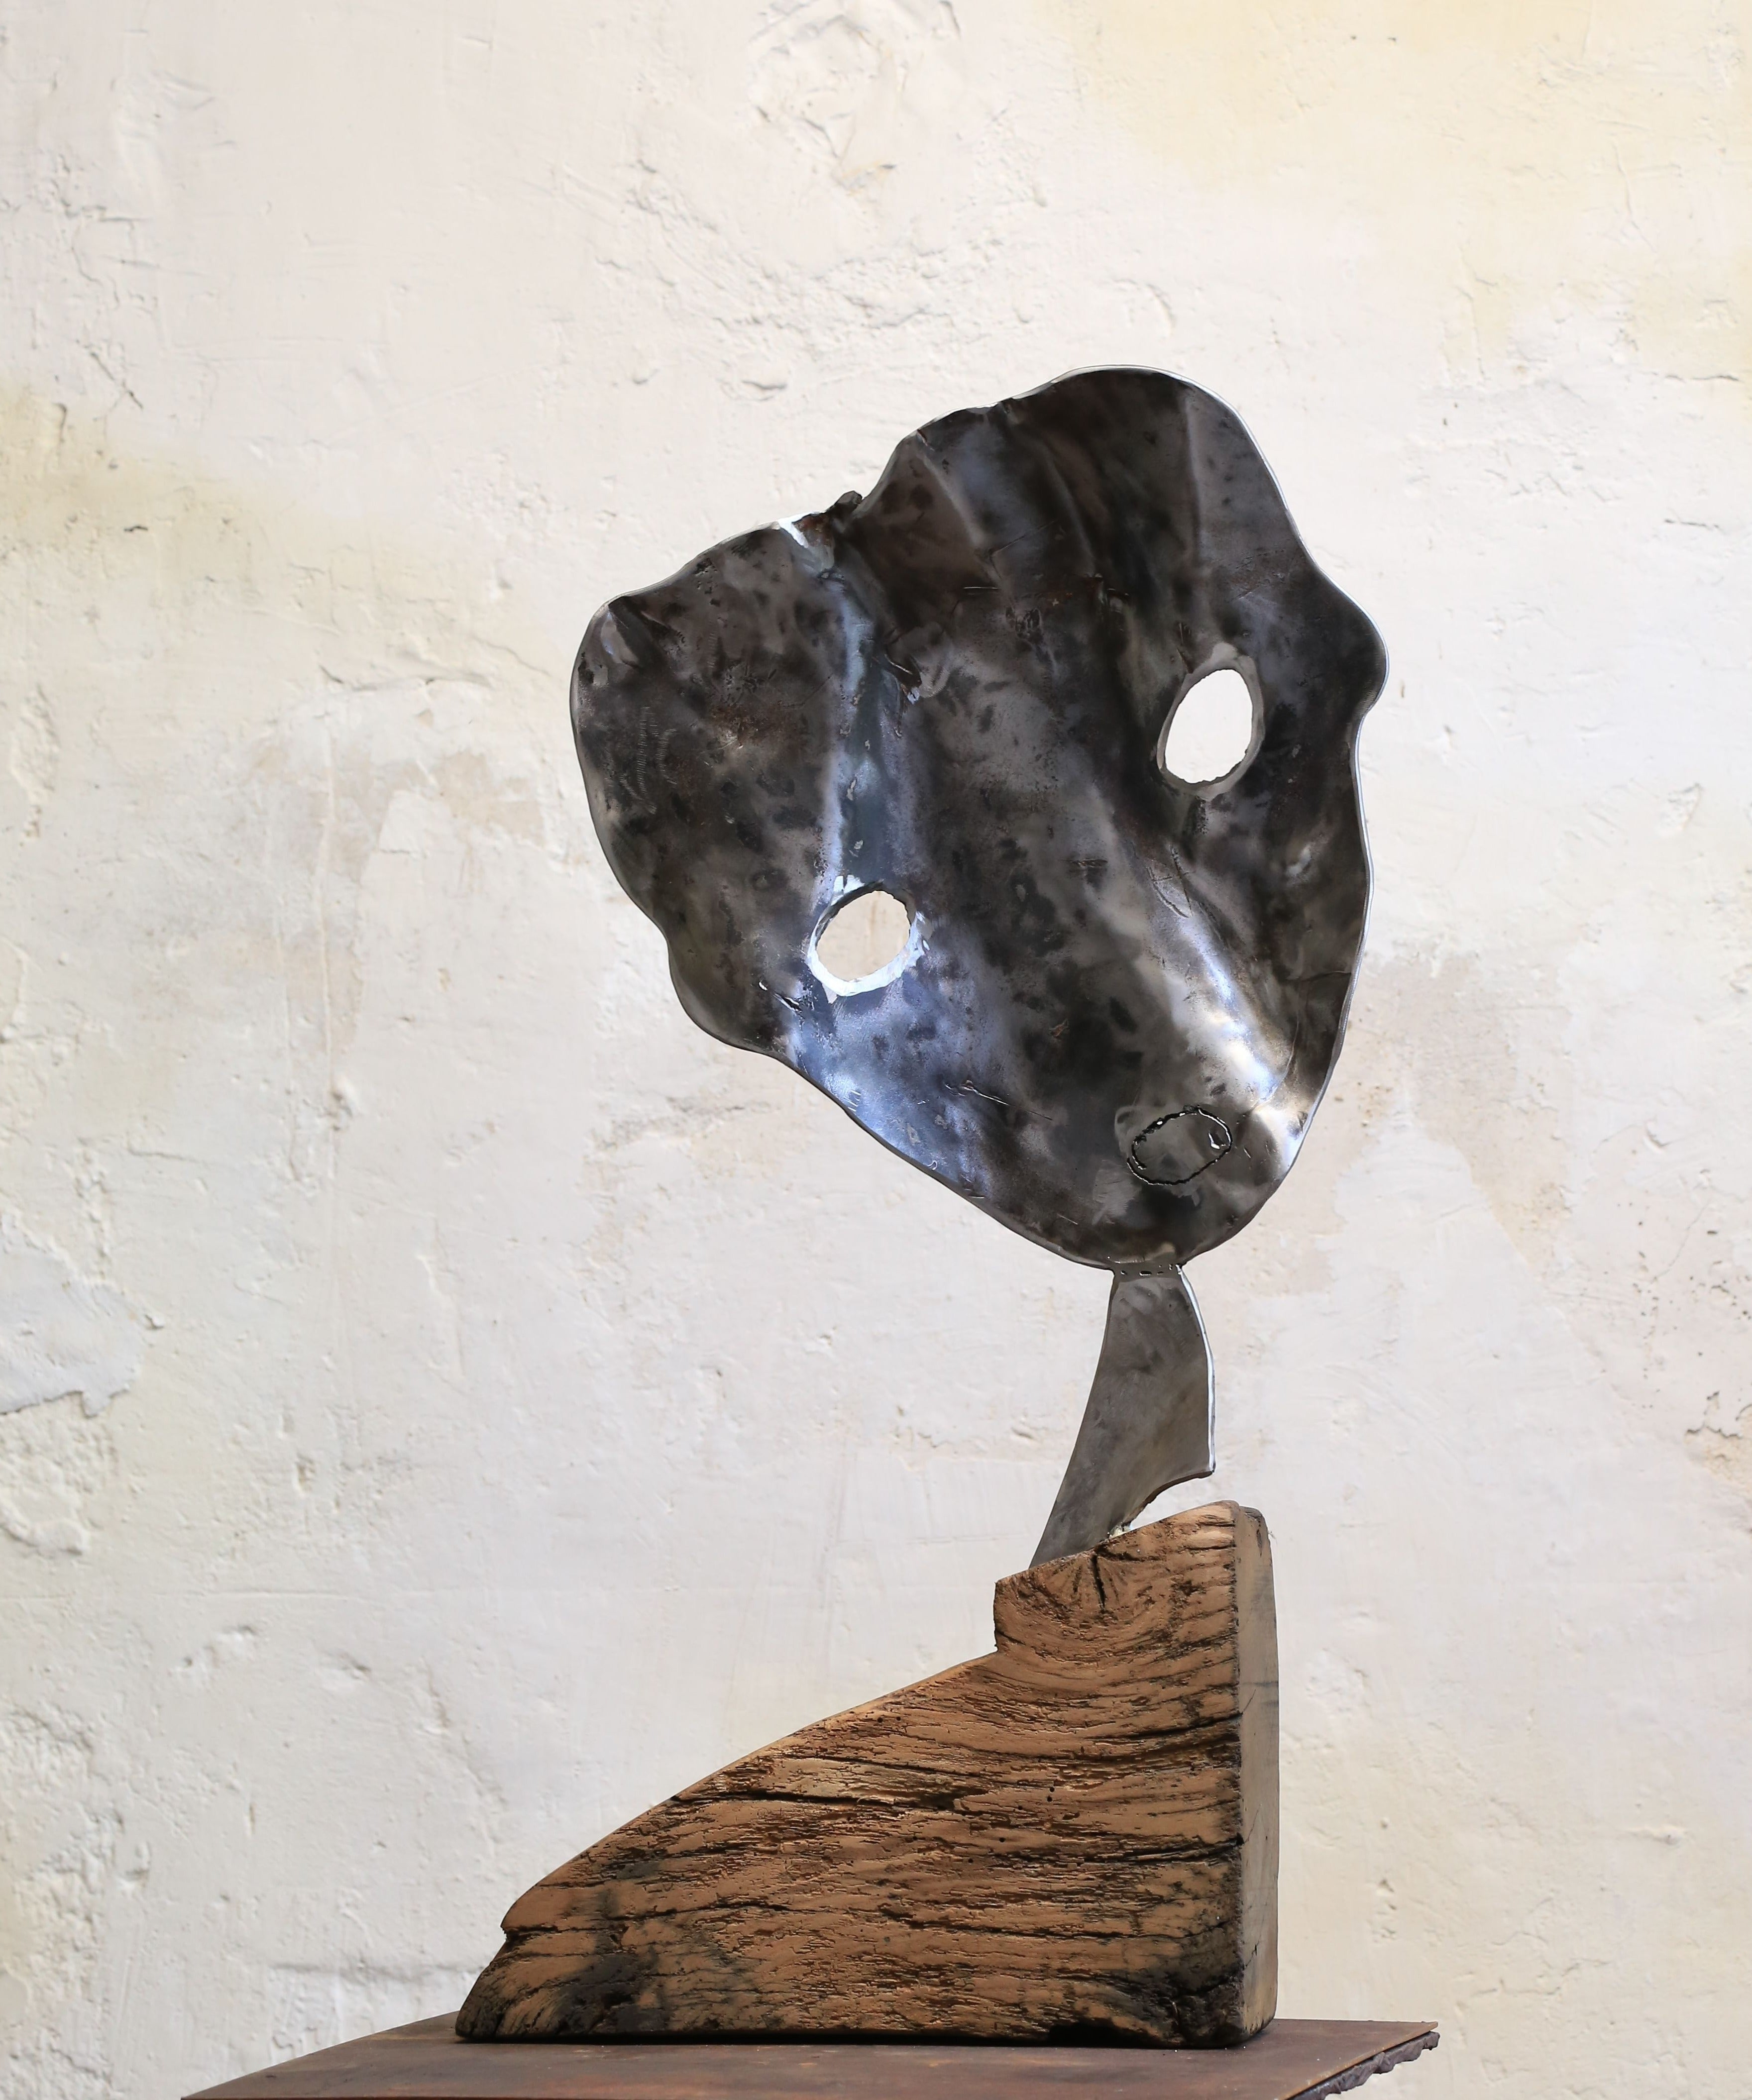 Sweet feeling - Haude Bernabé, 21st Century, Contemporary metal sculpture